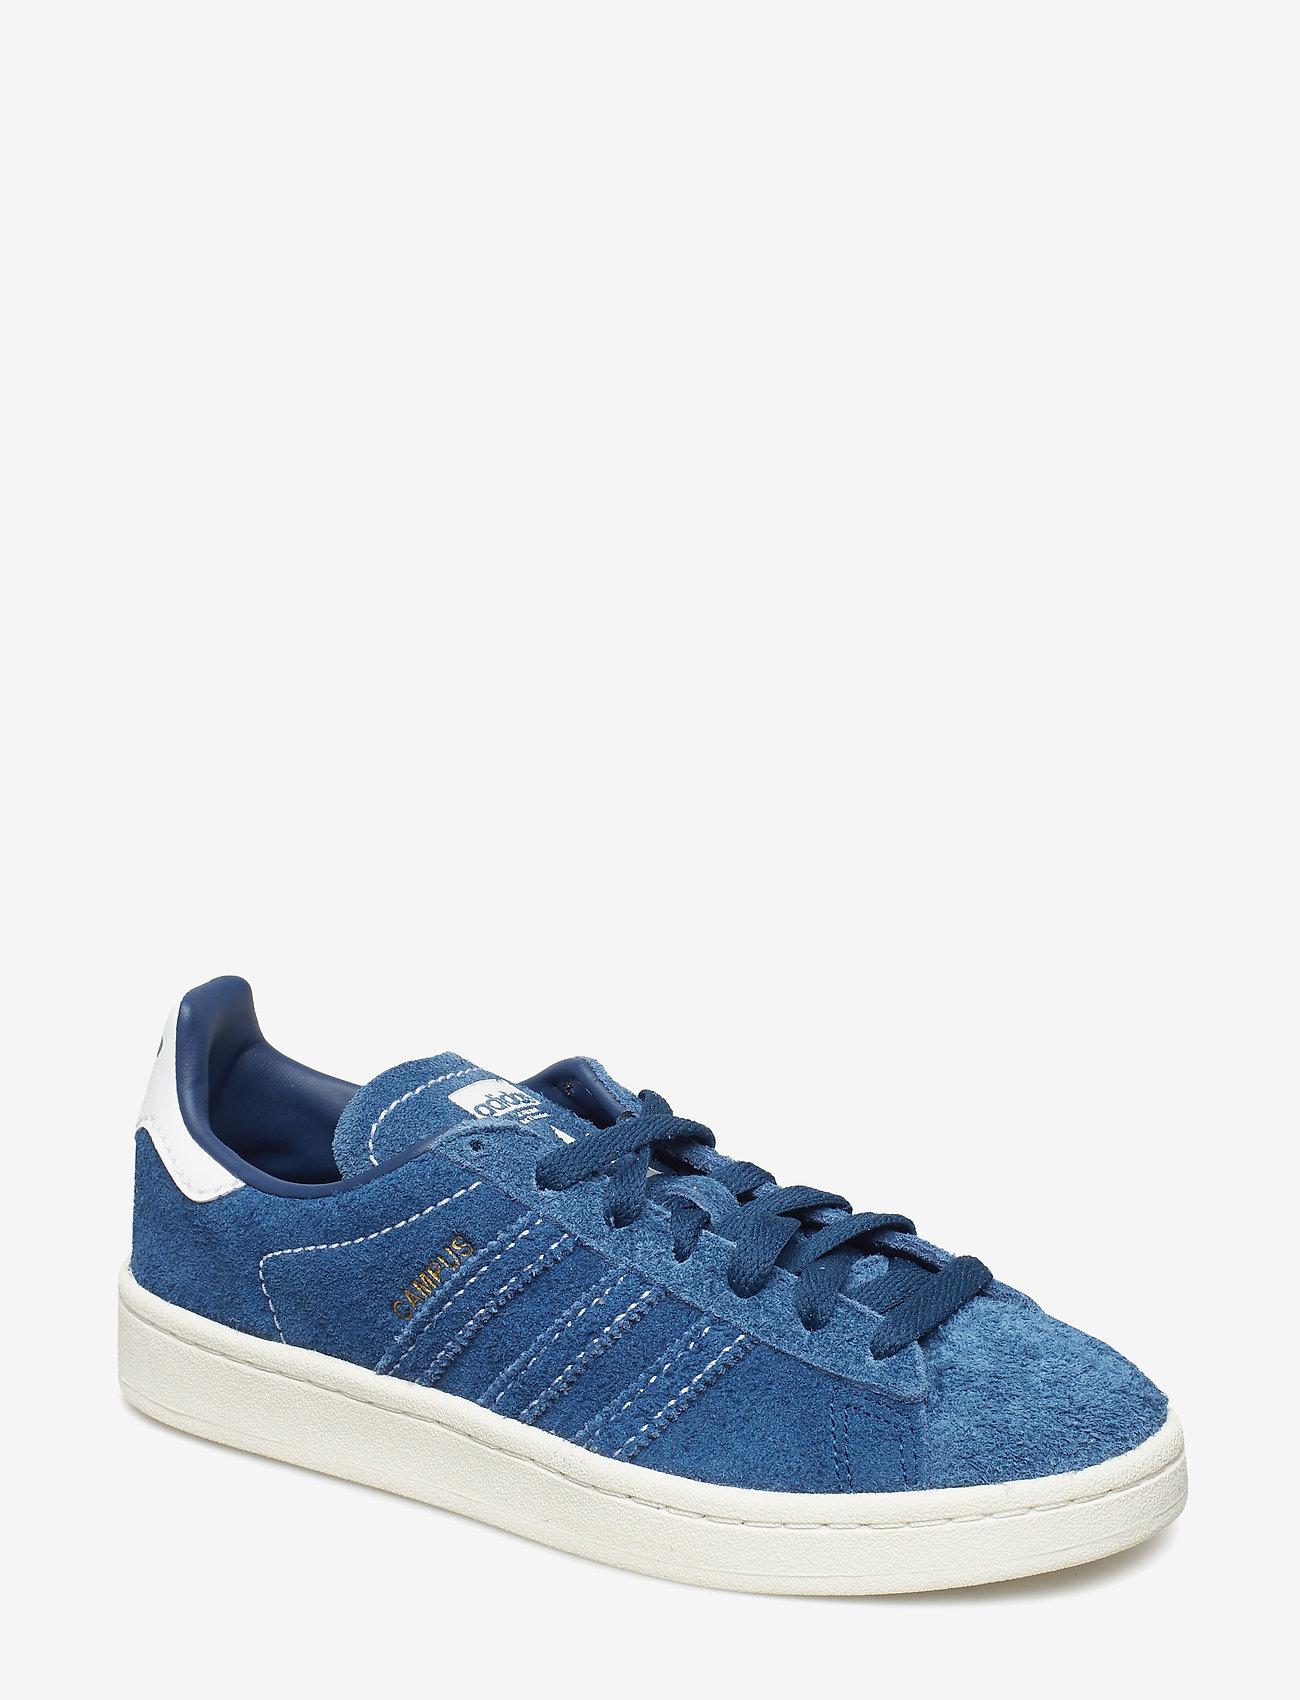 adidas Originals - CAMPUS - baskets basses - blunit/blunit/crywht